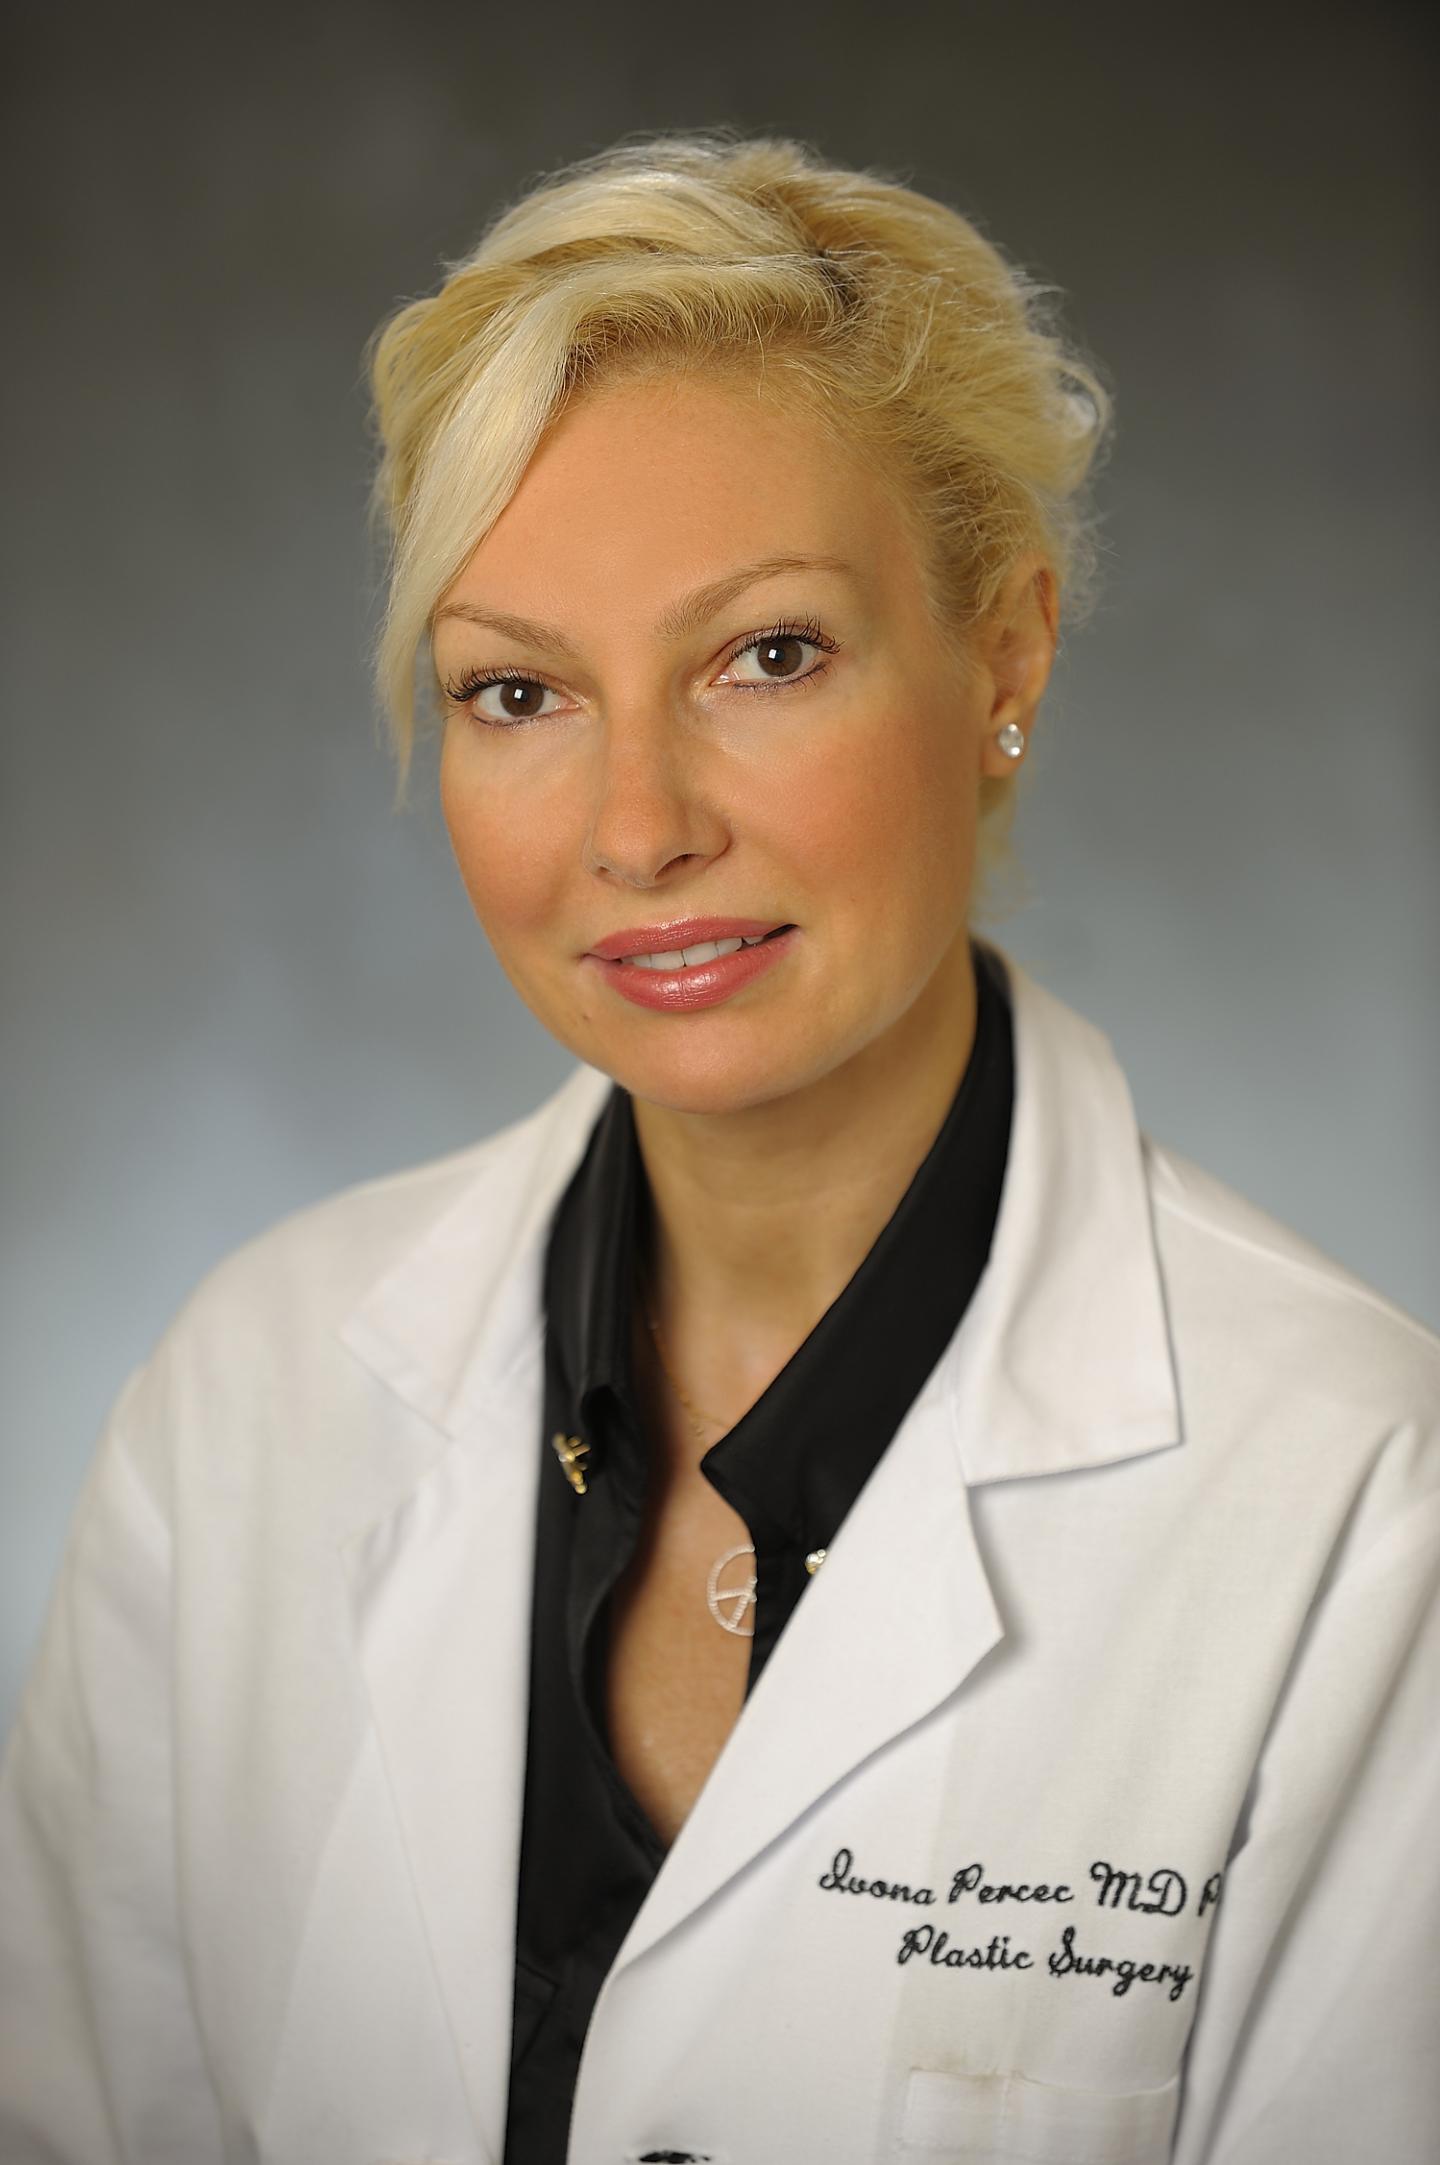 Ivona Percec, University of Pennsylvania School of Medicine